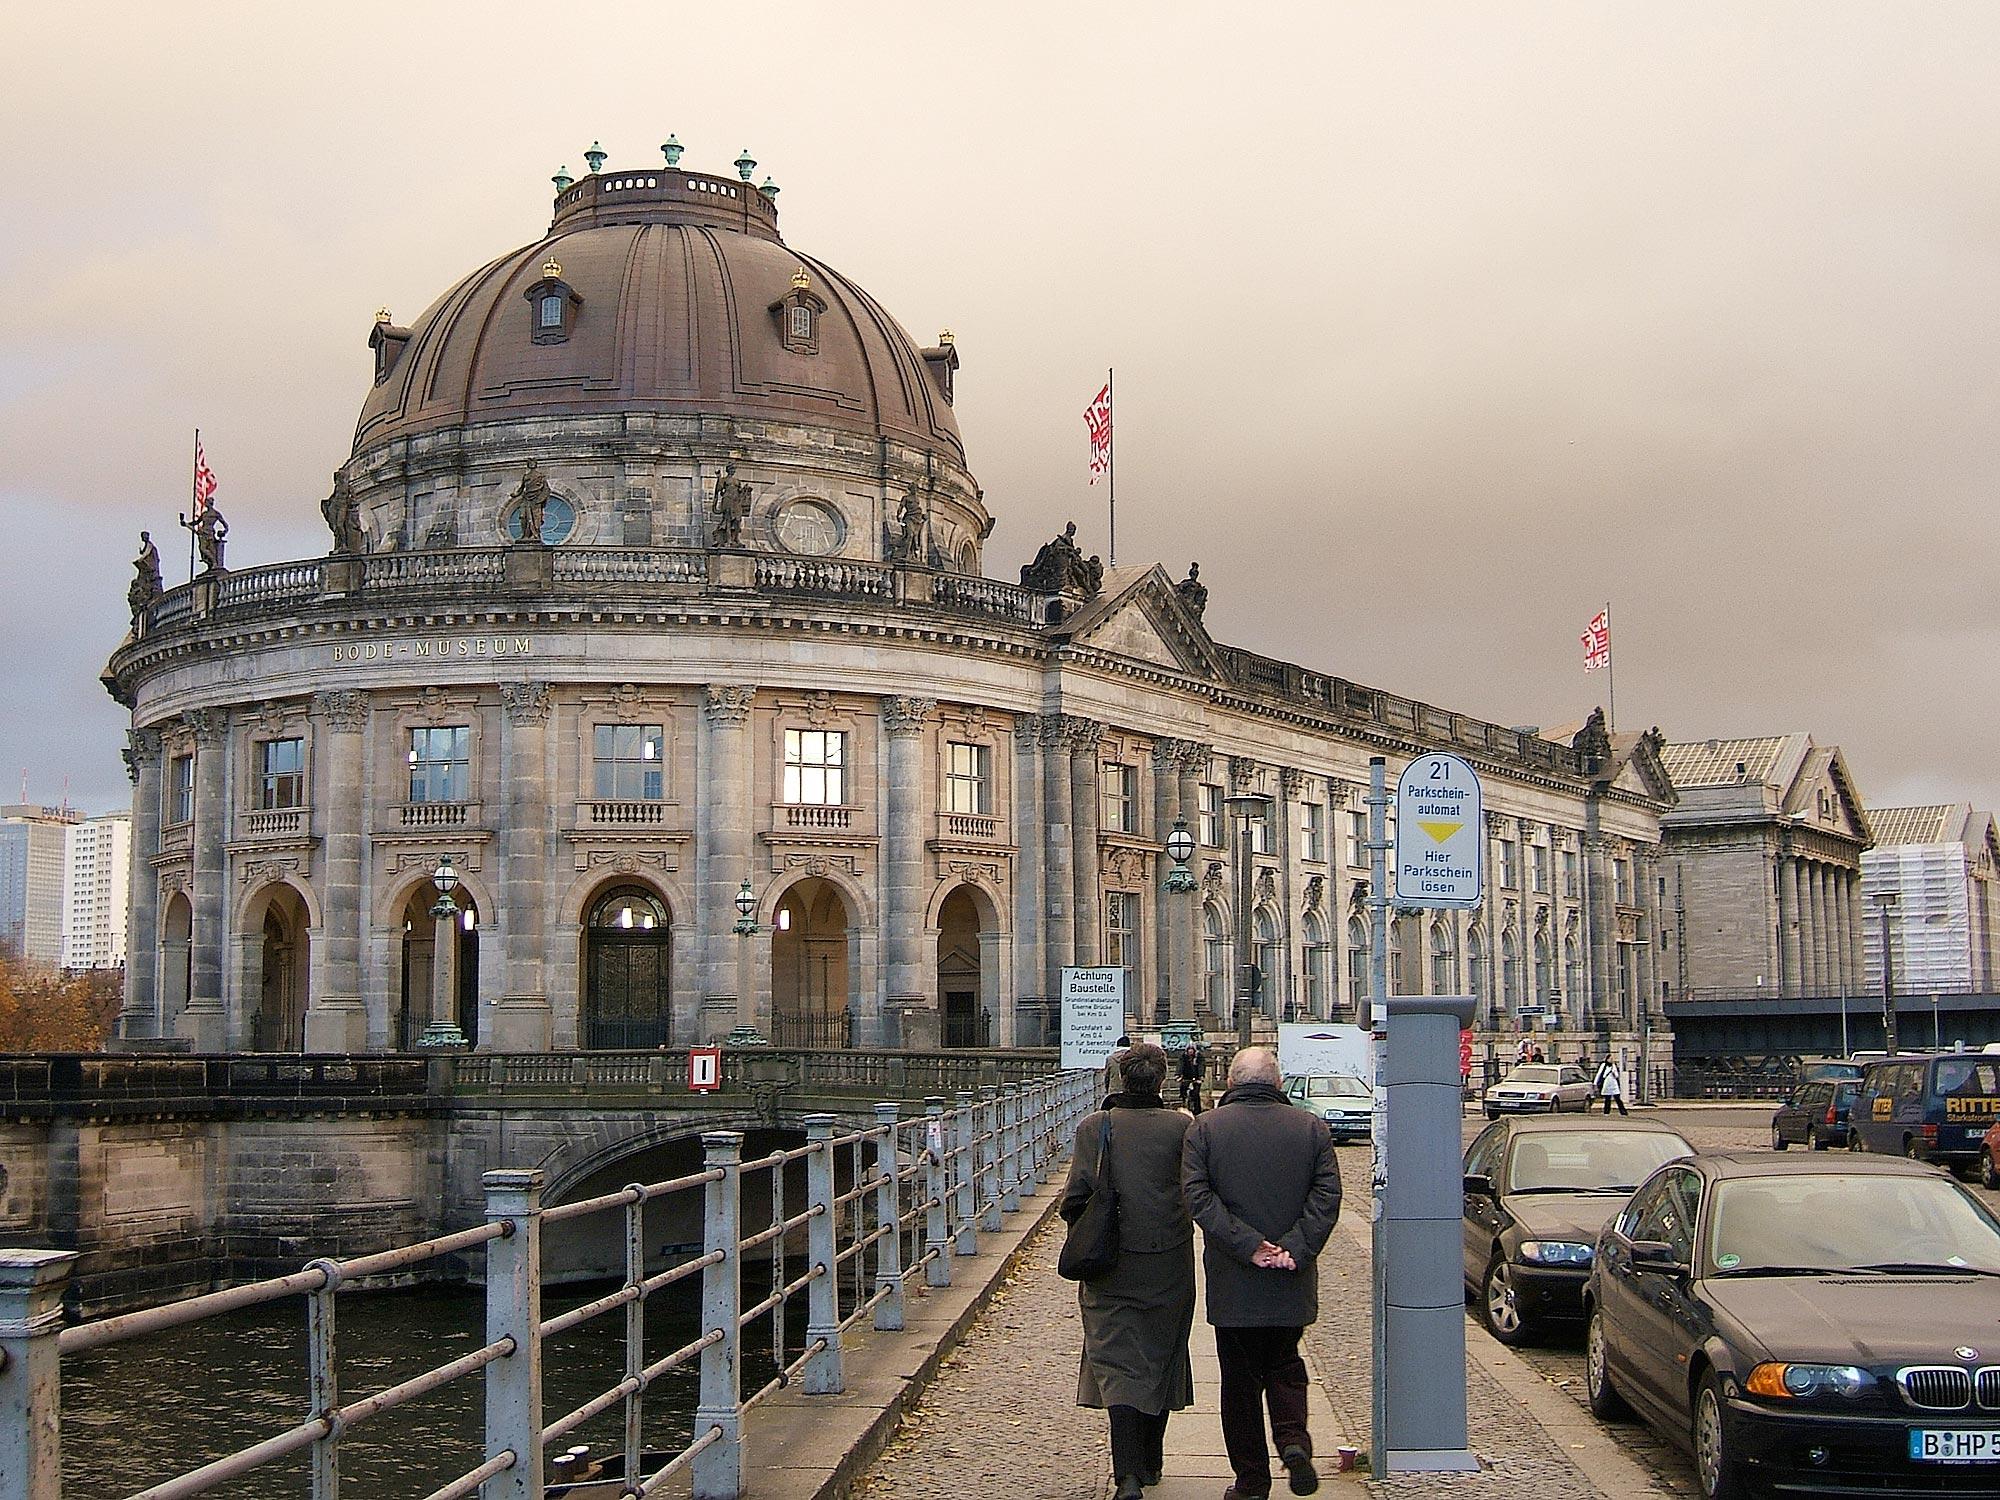 Bode-Museum - Berlim, Alemanha